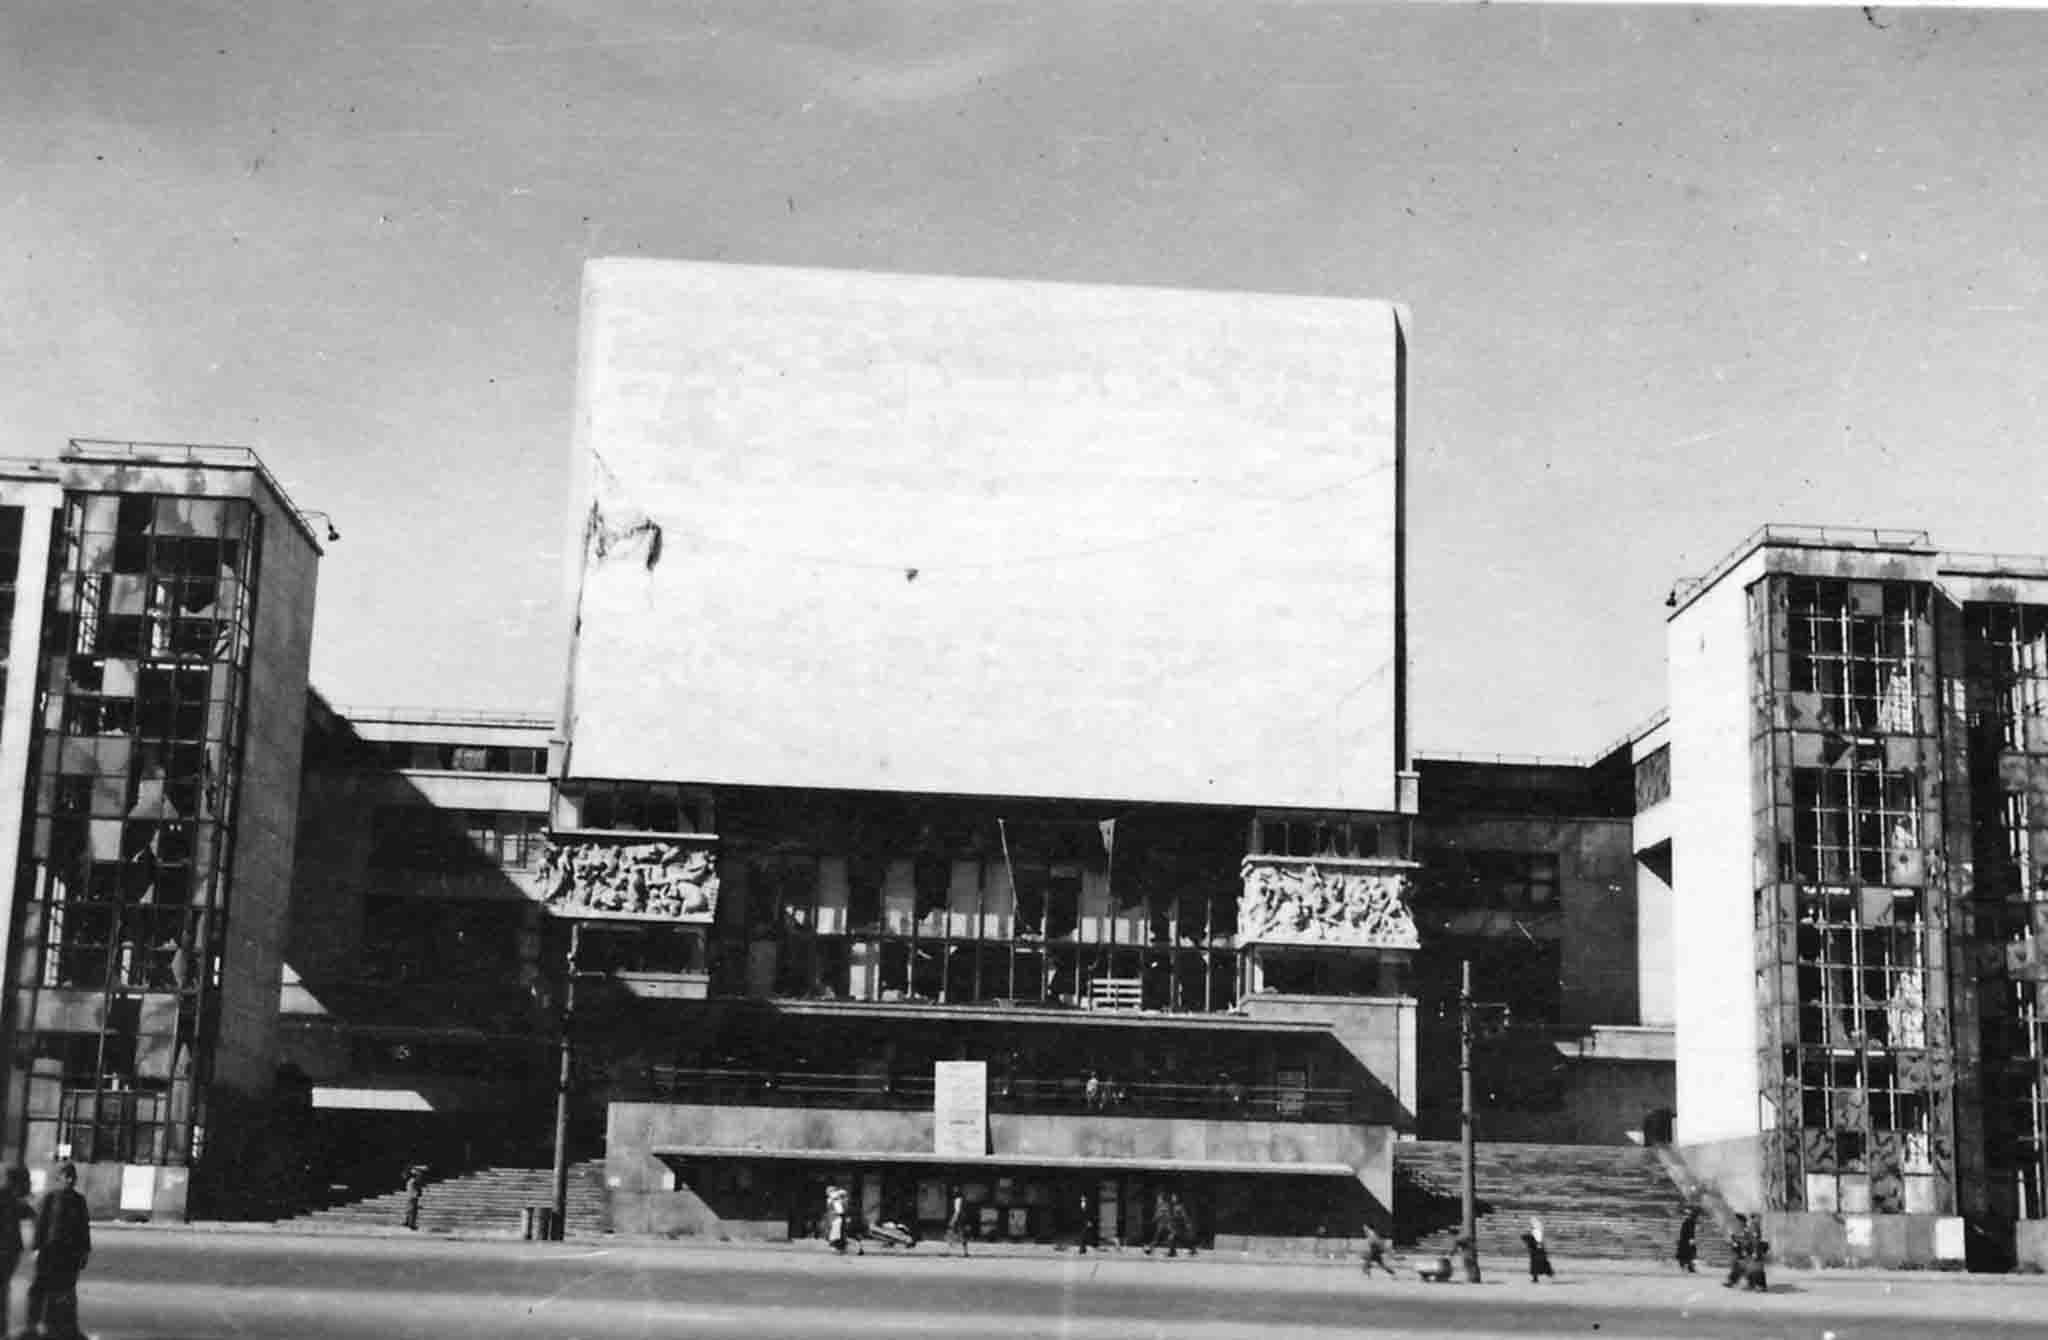 Gorky Theater